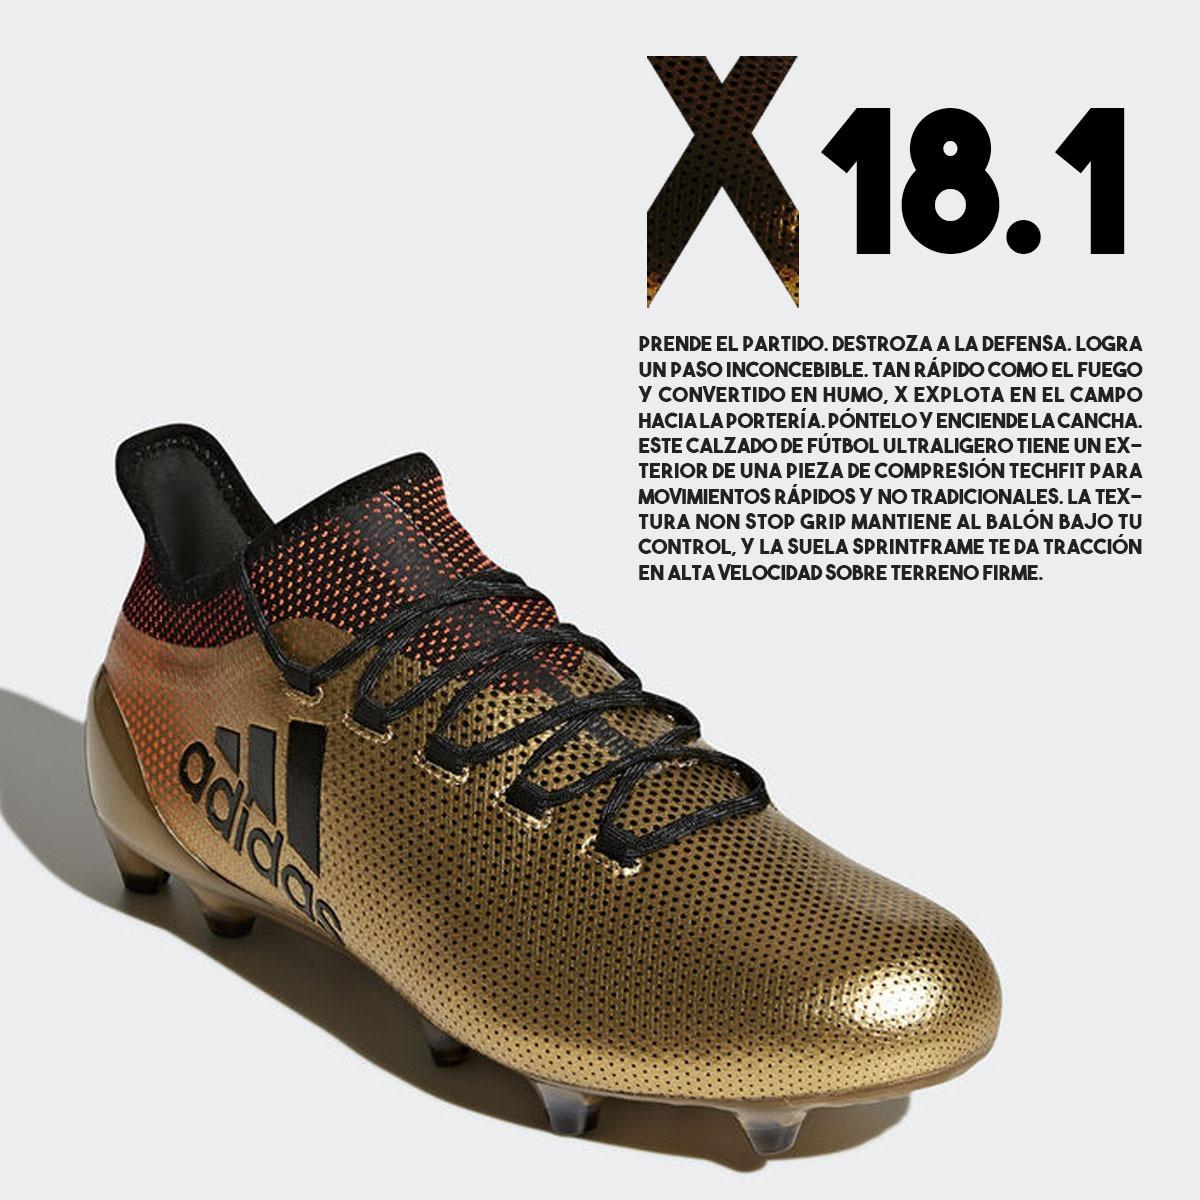 aba539858f889 champión calzado adidas x 17.1 de fútbol cancha 11. Cargando zoom... calzado  adidas fútbol. Cargando zoom.